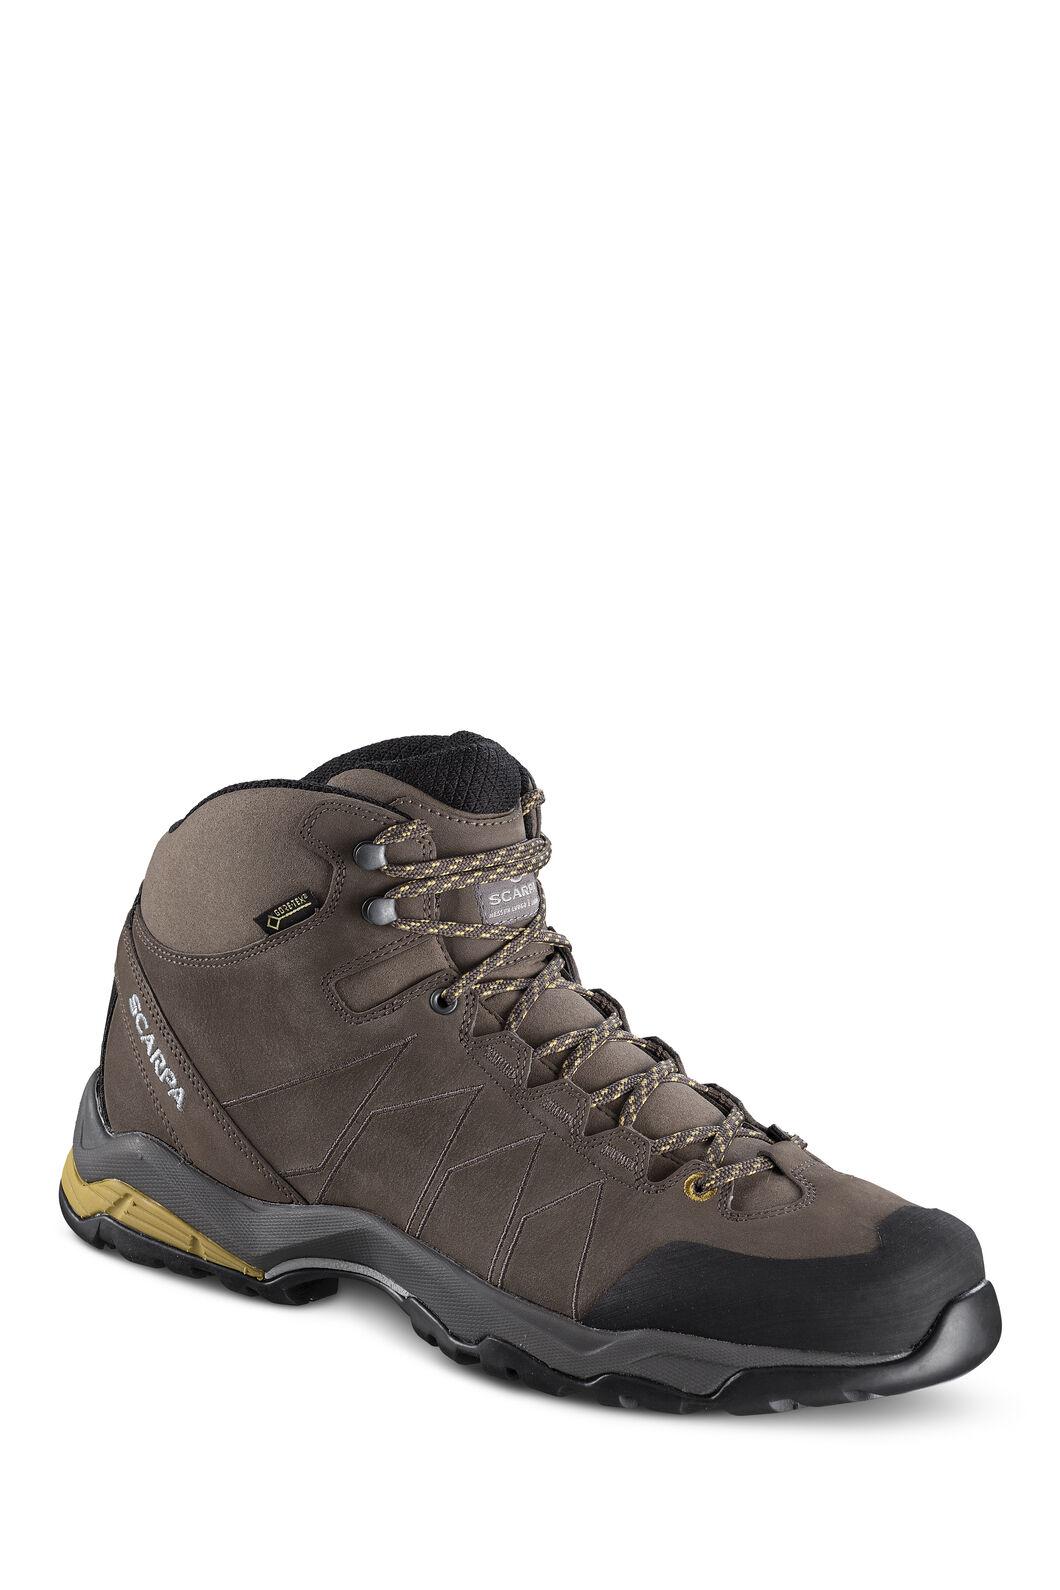 Scarpa Men's Moraine Plus GTX Hiking Boots, Charcoal/SulphurGreen, hi-res